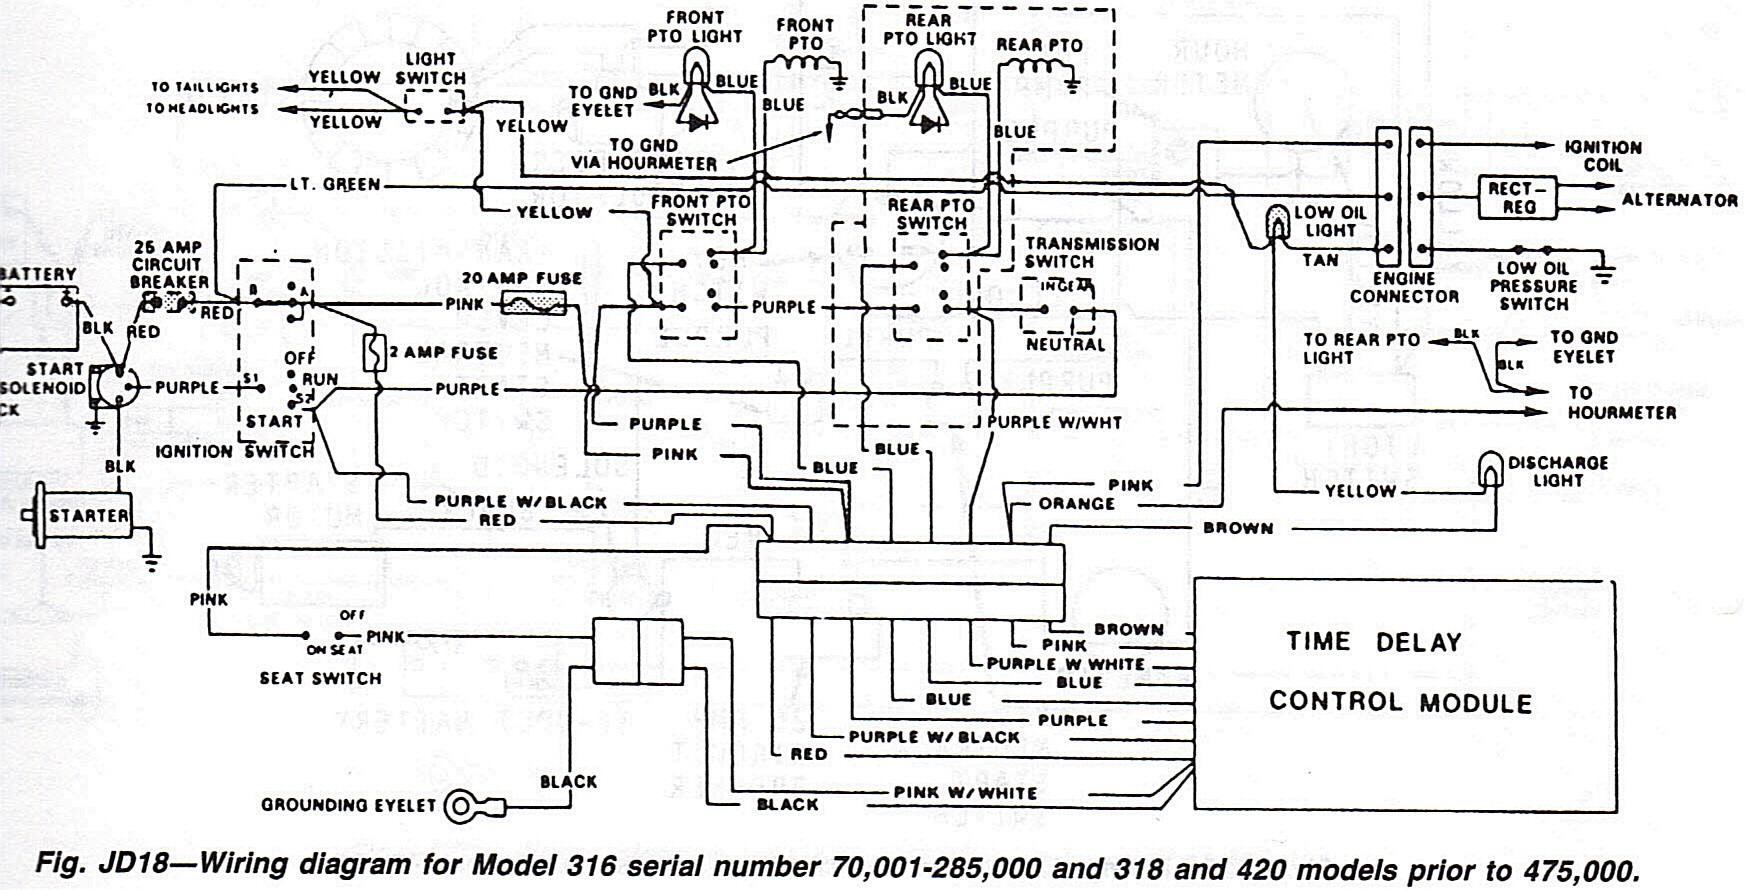 DIAGRAM] Wiring Diagram Rheem Xe10p06pu20uo FULL Version HD Quality Rheem  Xe10p06pu20uo - IT-DIAGRAM.INK3.ITInk3